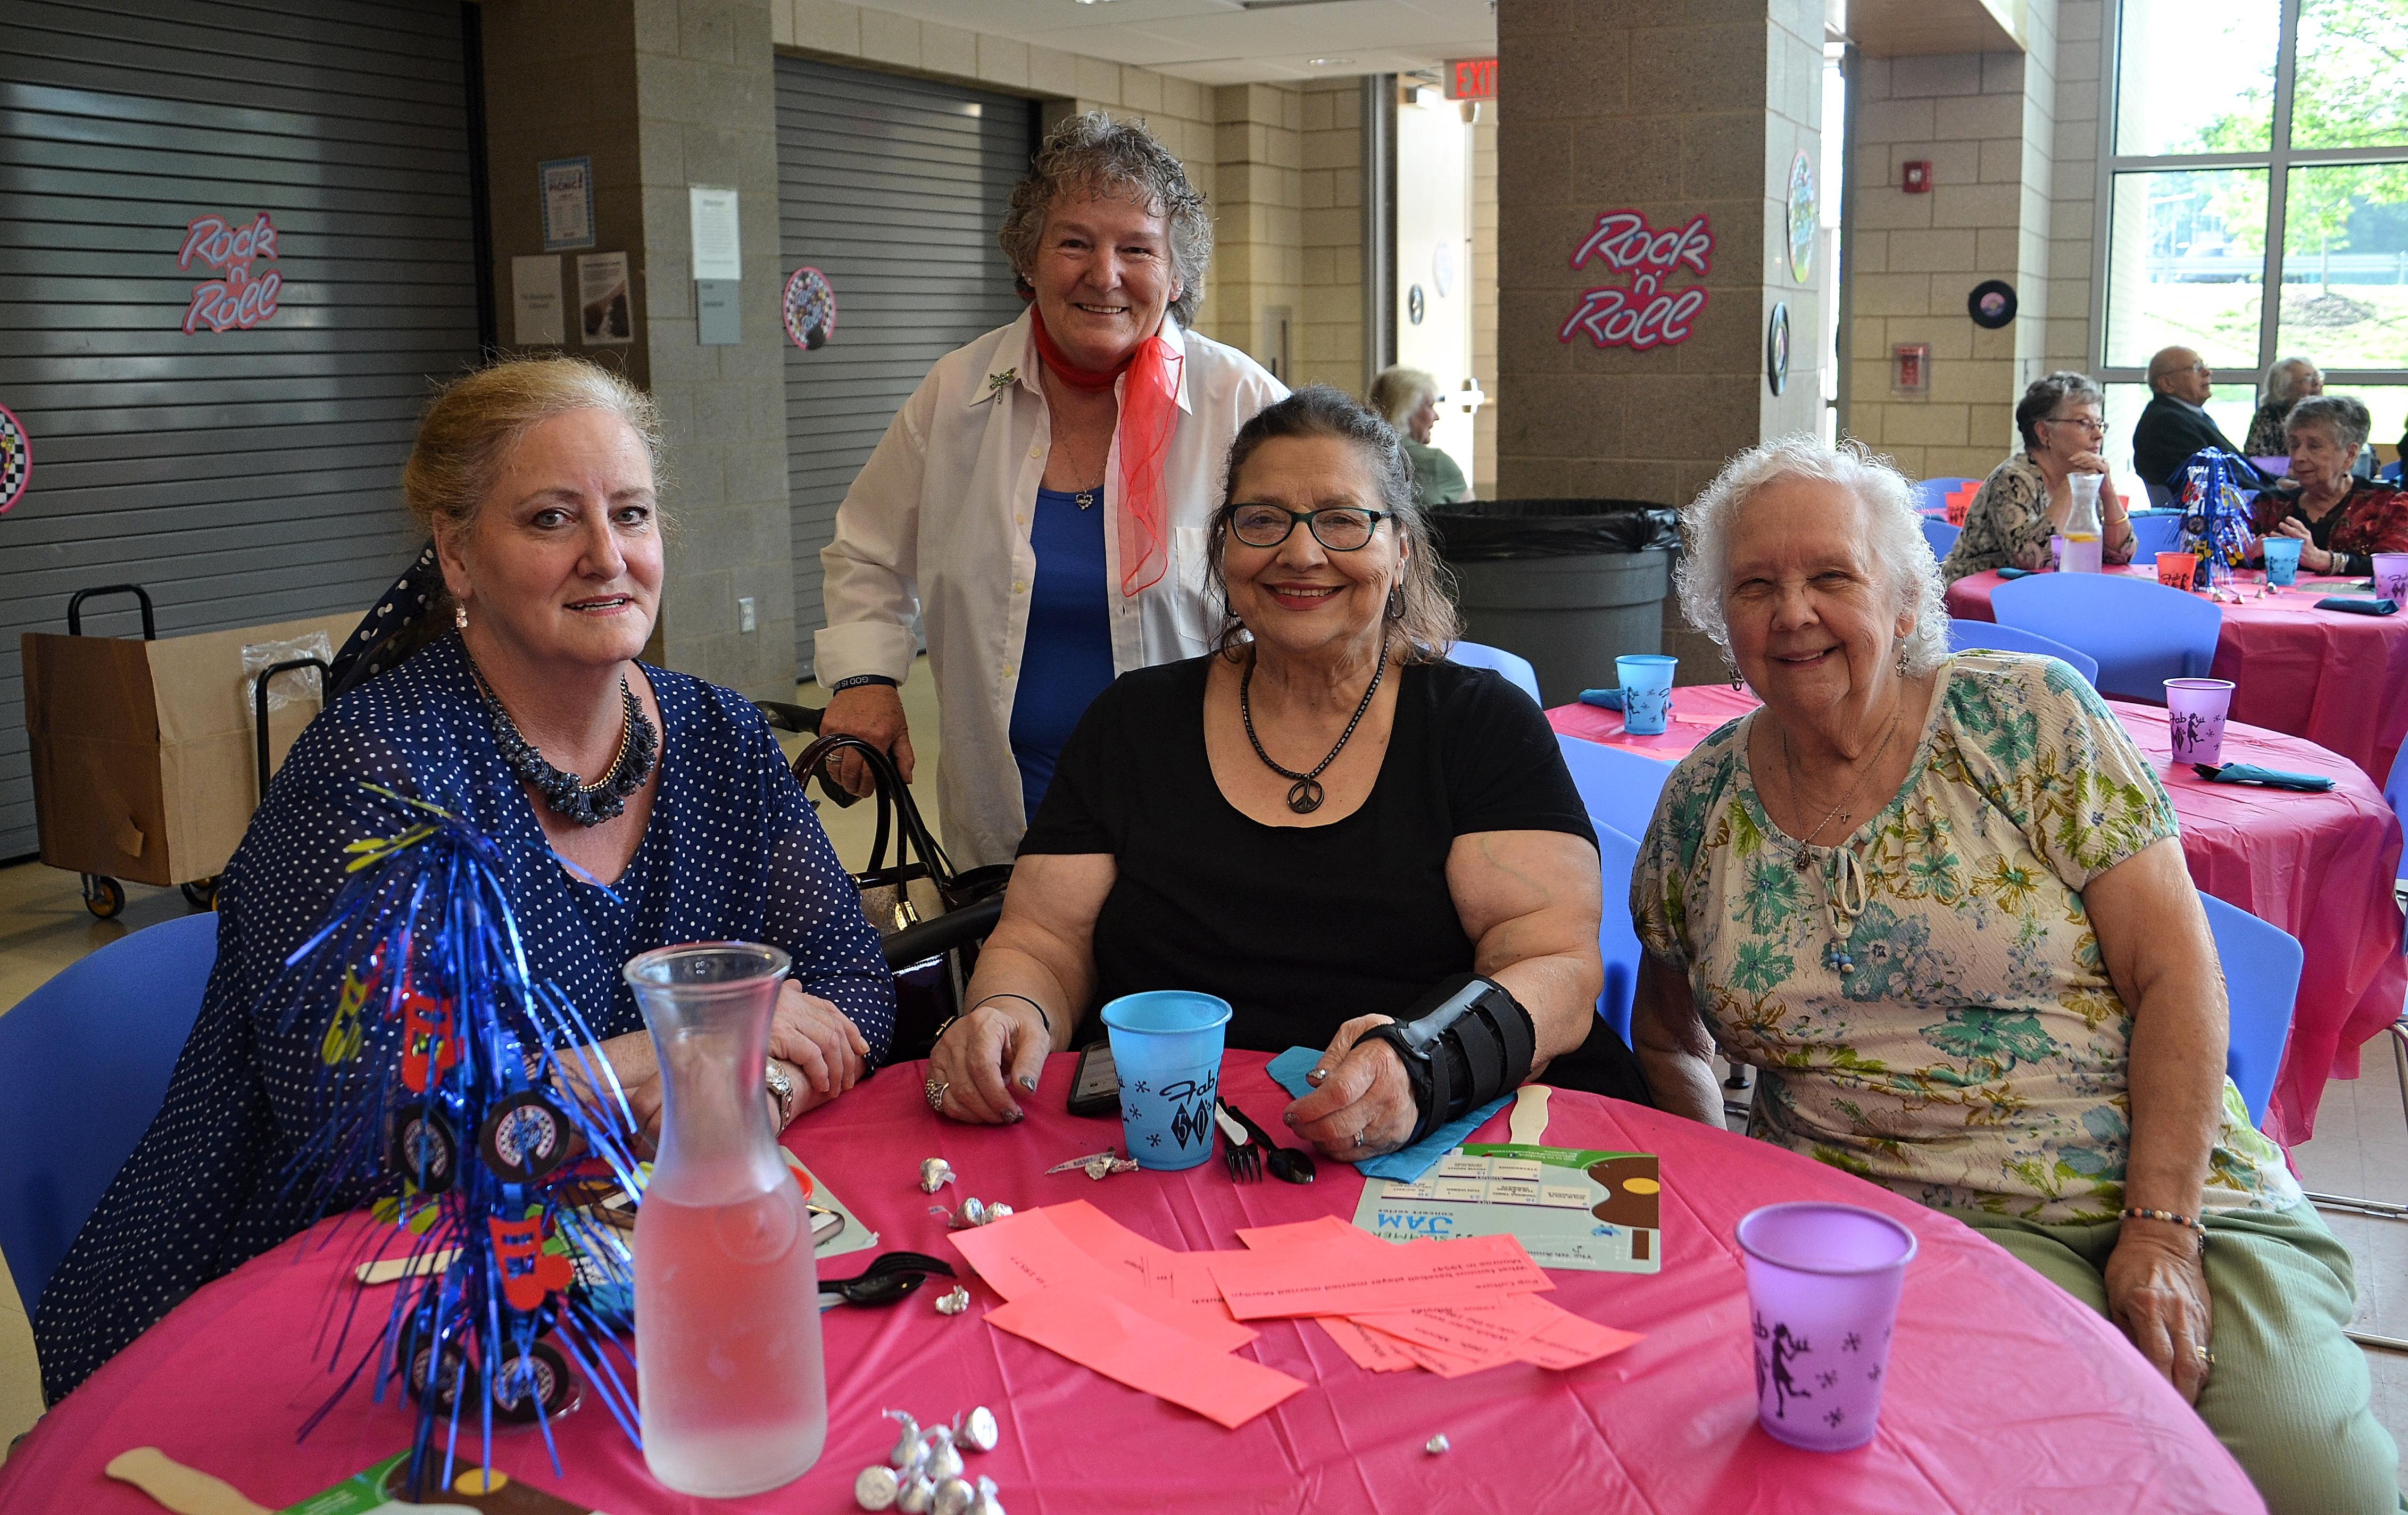 Senior Citizen Dinner Dance Gets People Grooving To Music